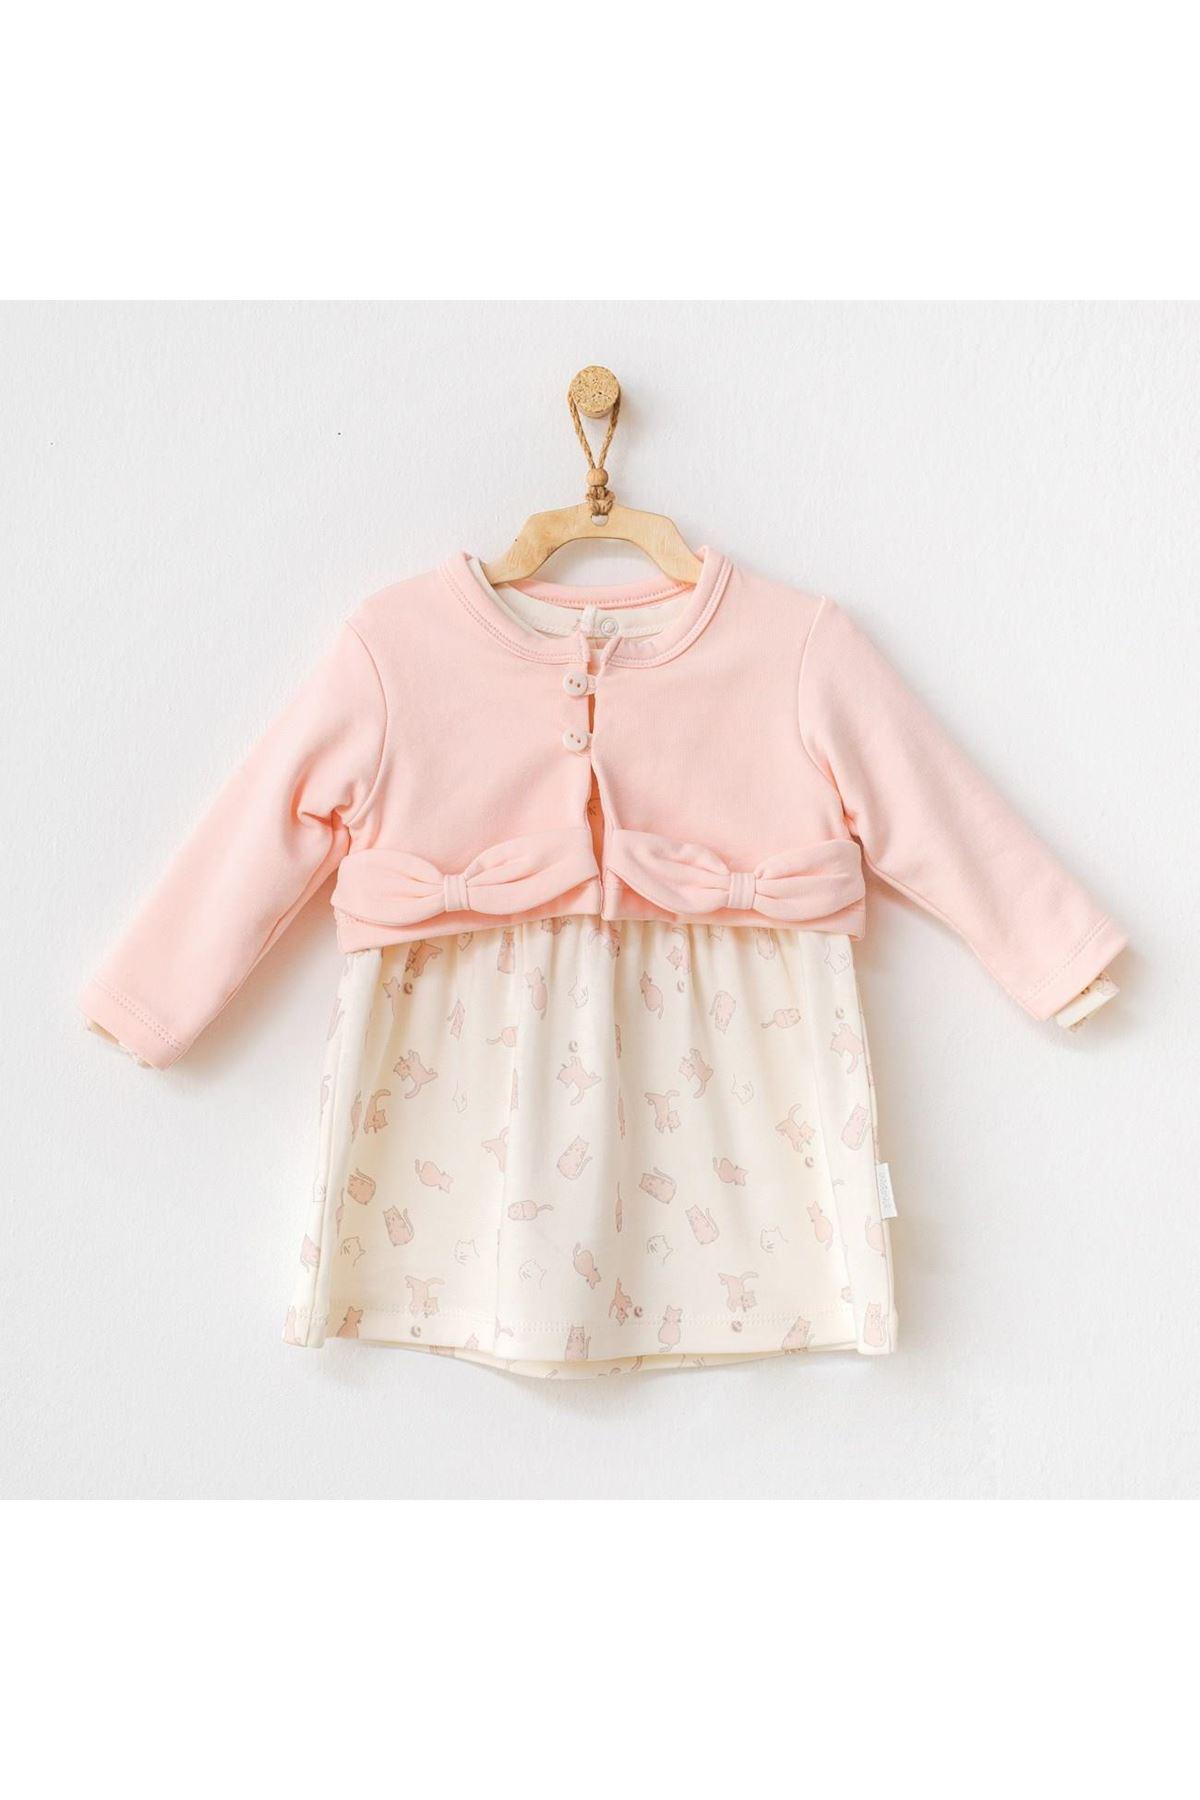 Andywawa AC21121 Meow Elbise Takım Pink